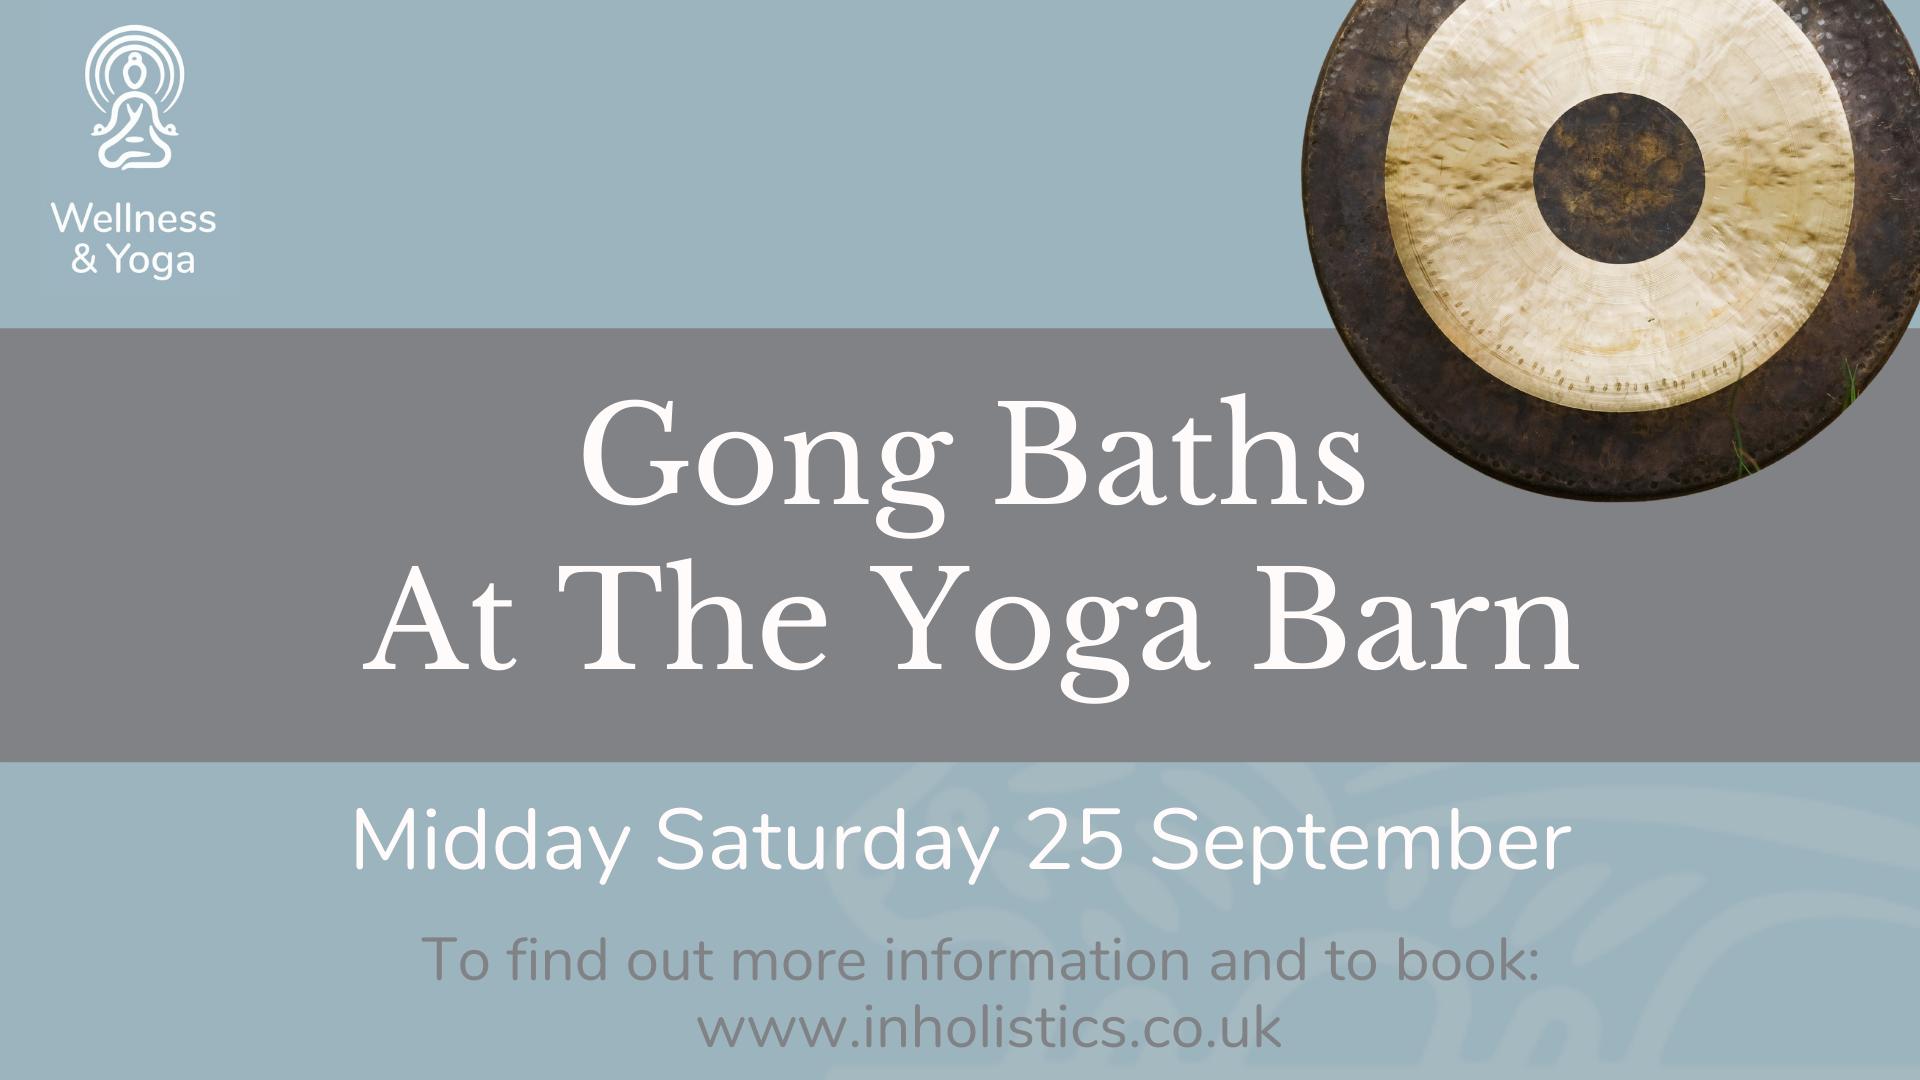 Gong Bath Workshop @ Jordan's Courtyard